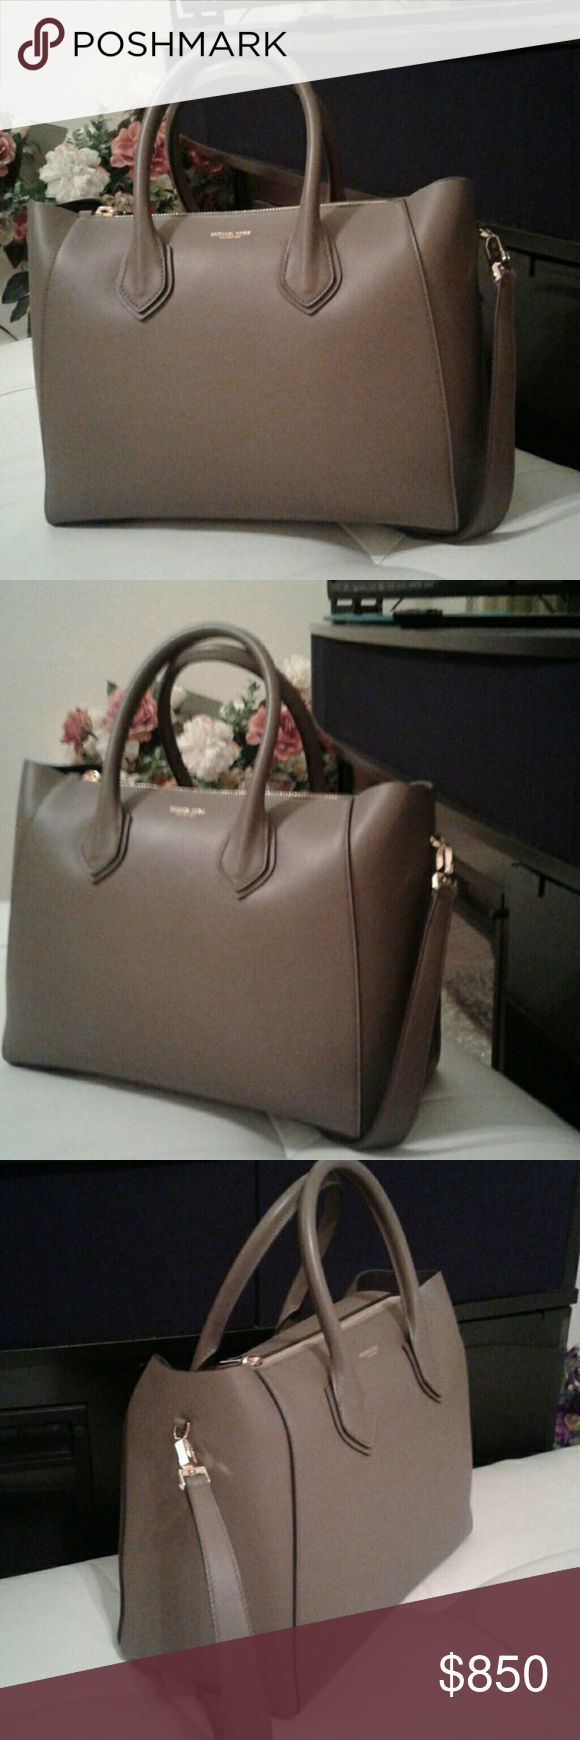 72493ed1a761 BRAND NEW...HELENA SATCHEL MK Gorgeous brand new with tags MK Helena ...